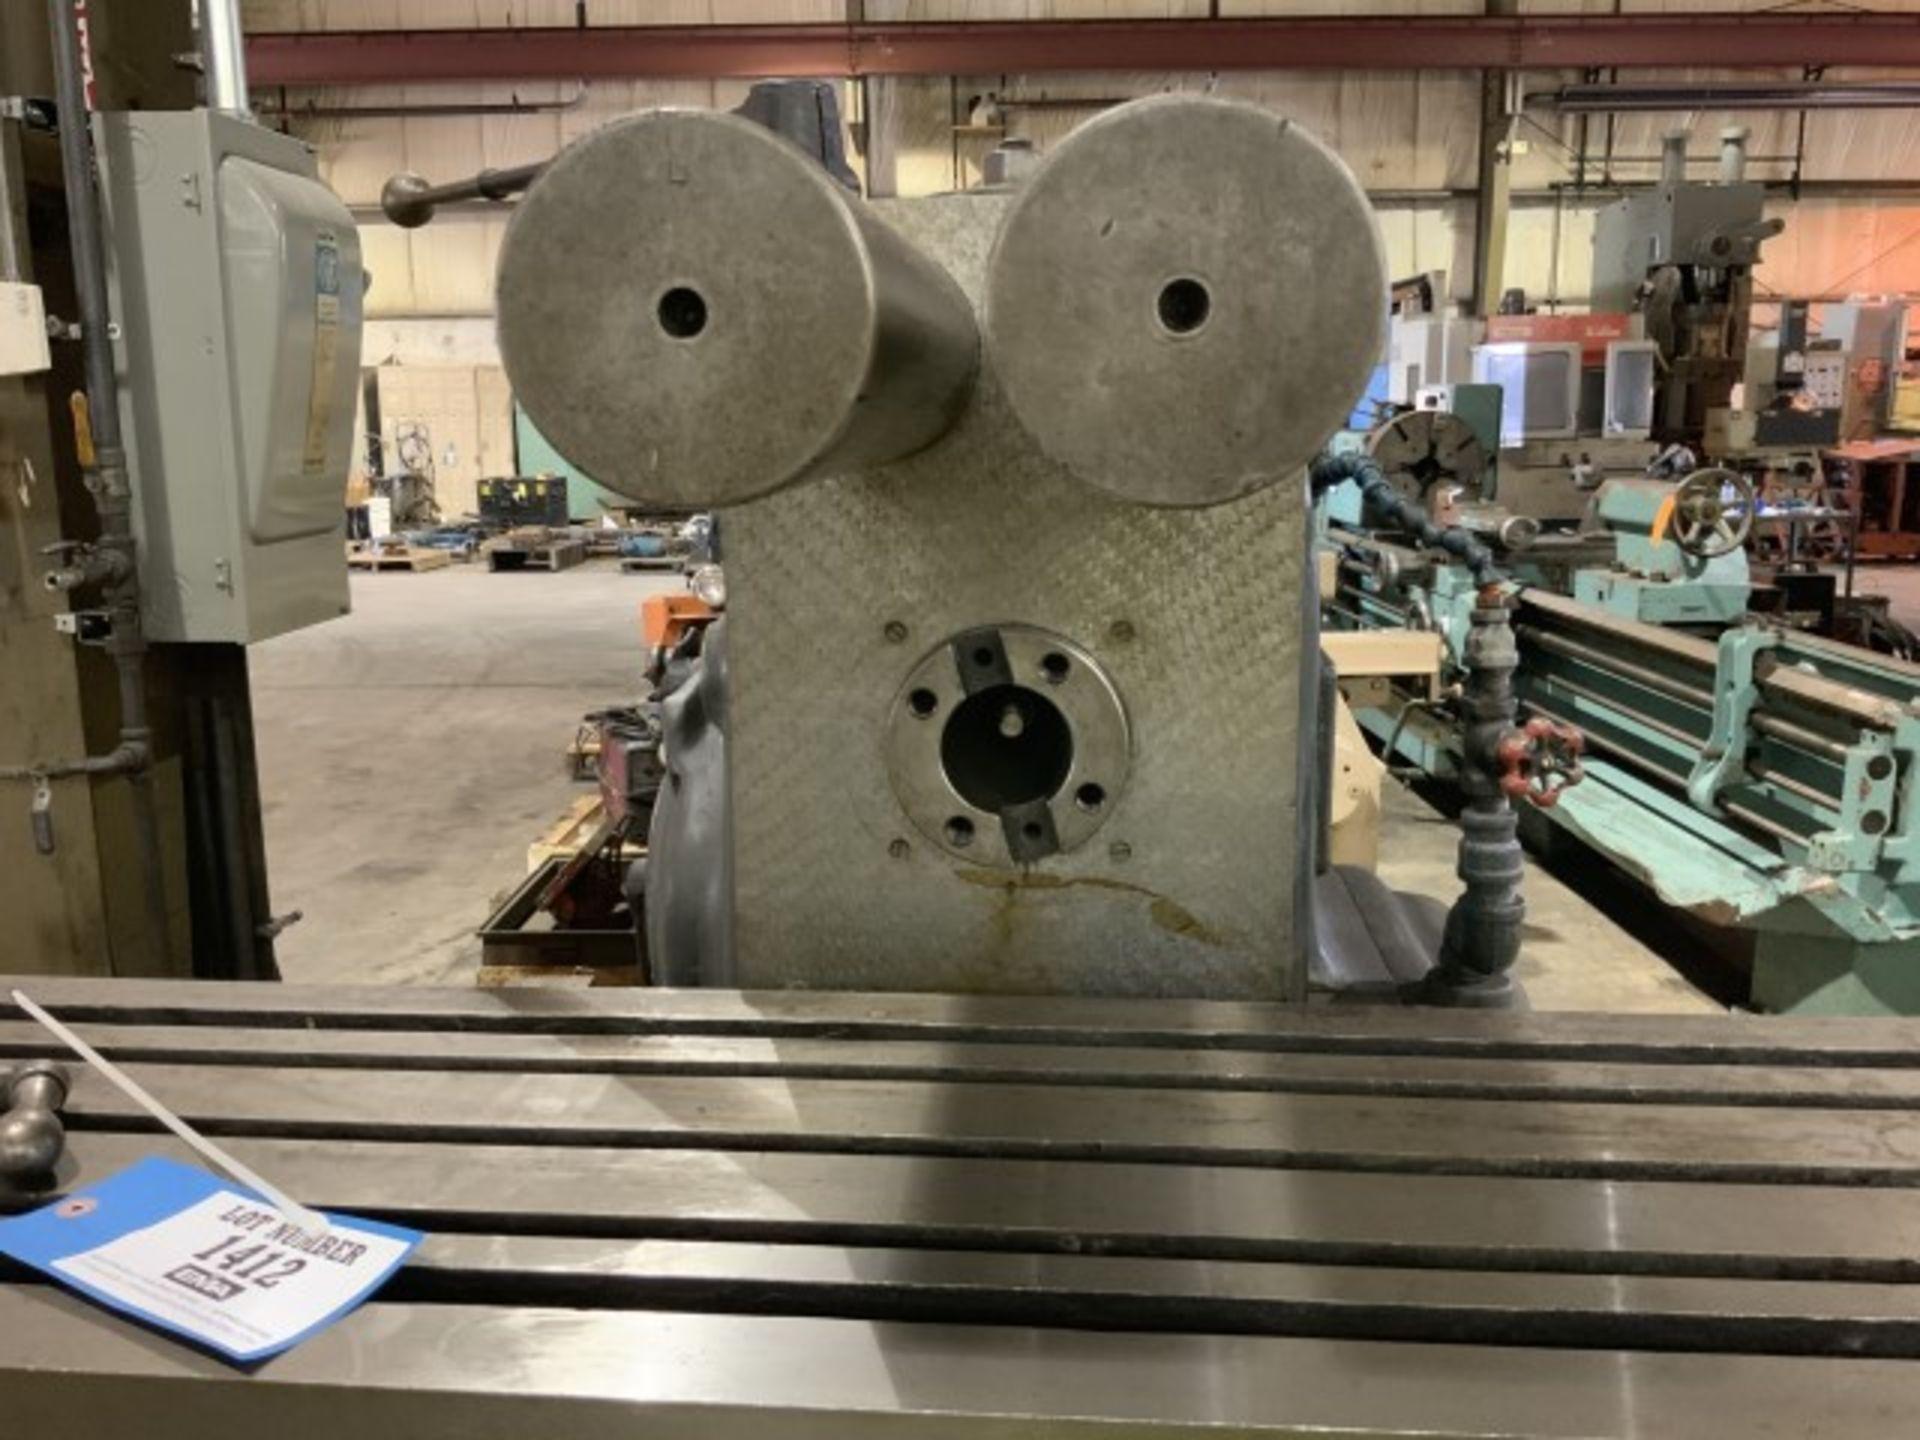 Horizontal milling machine - Image 4 of 6